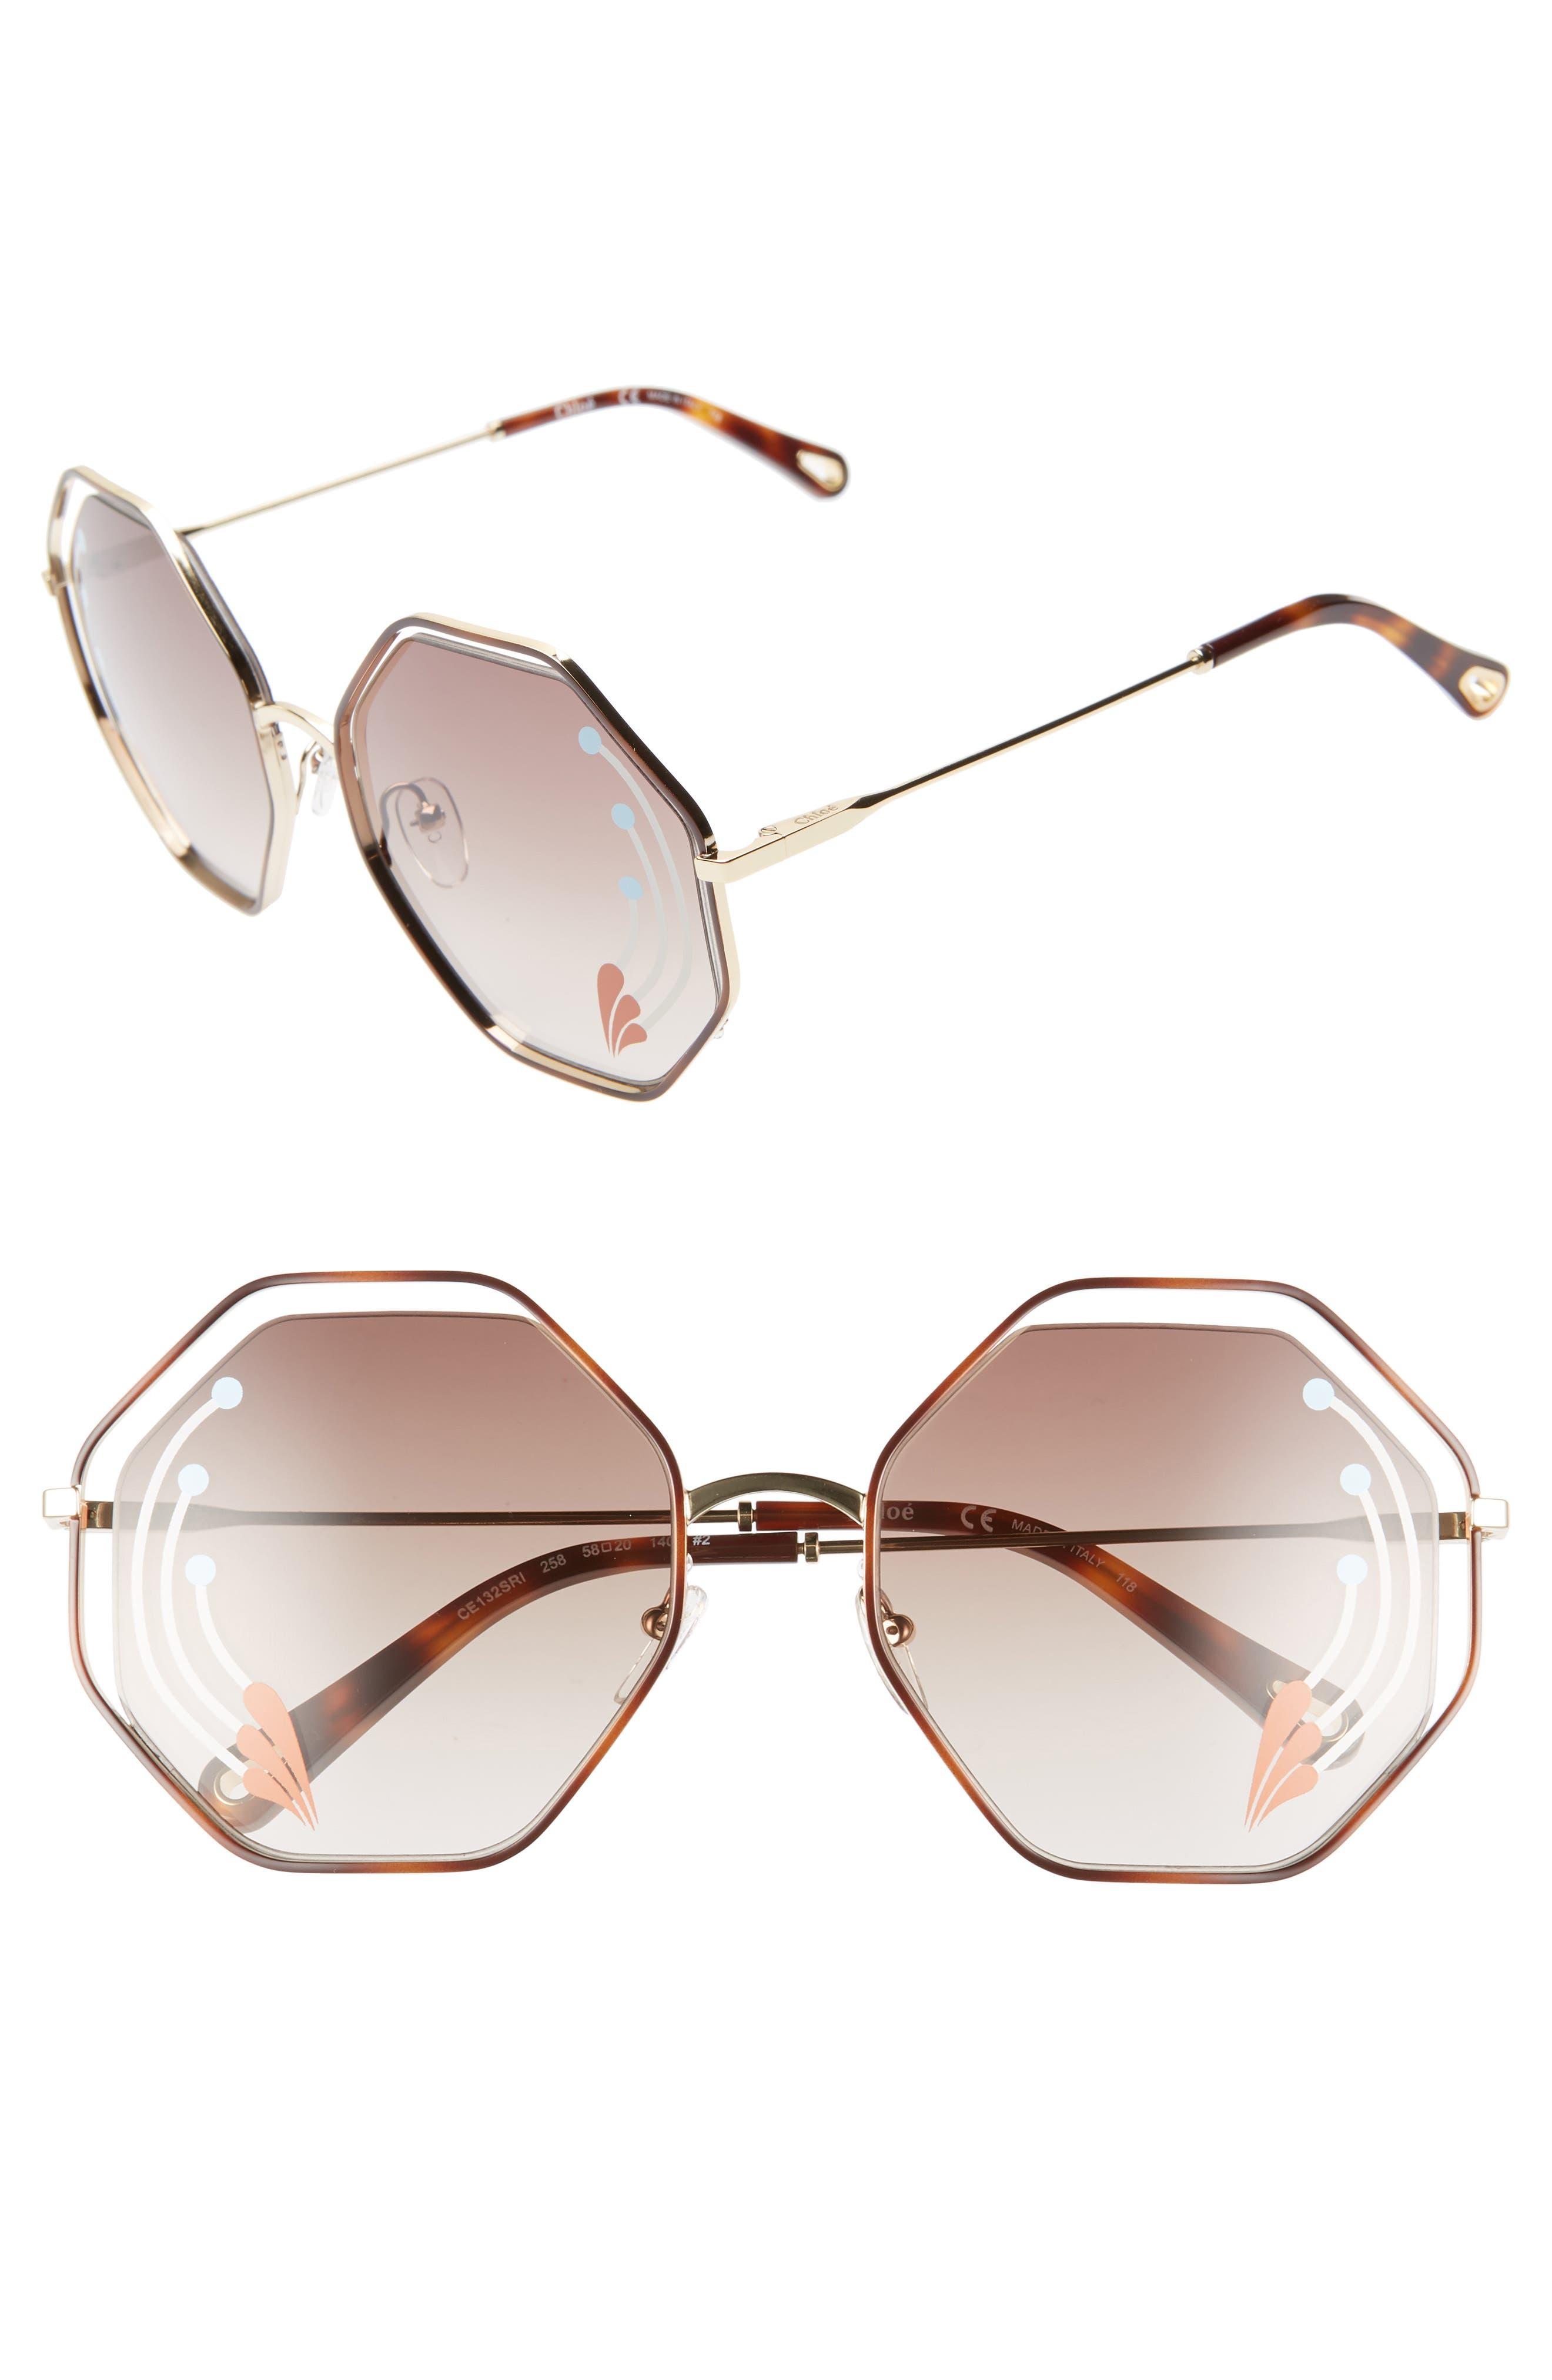 Poppy 58mm Octagonal Halo Lens Sunglasses,                         Main,                         color, HAVANA/ GOLD BROWN W PRINT